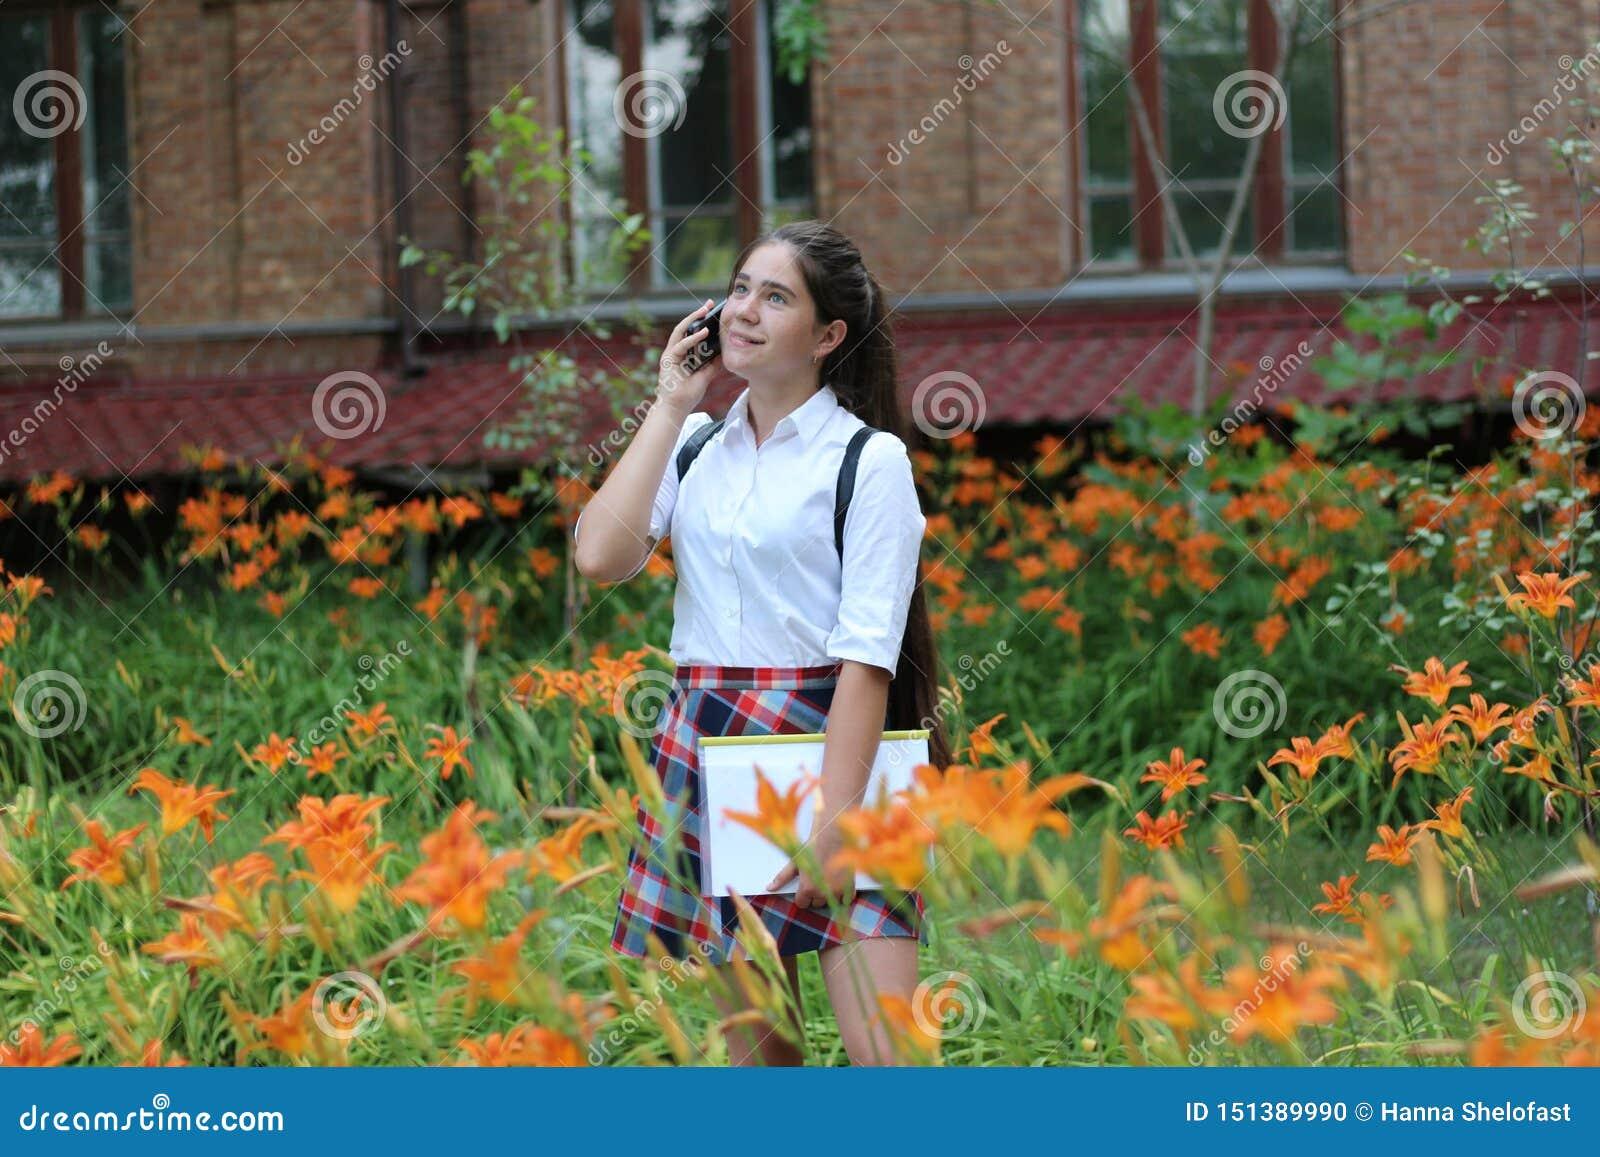 Schoolgirl girl with long hair in school uniform talking on the phone